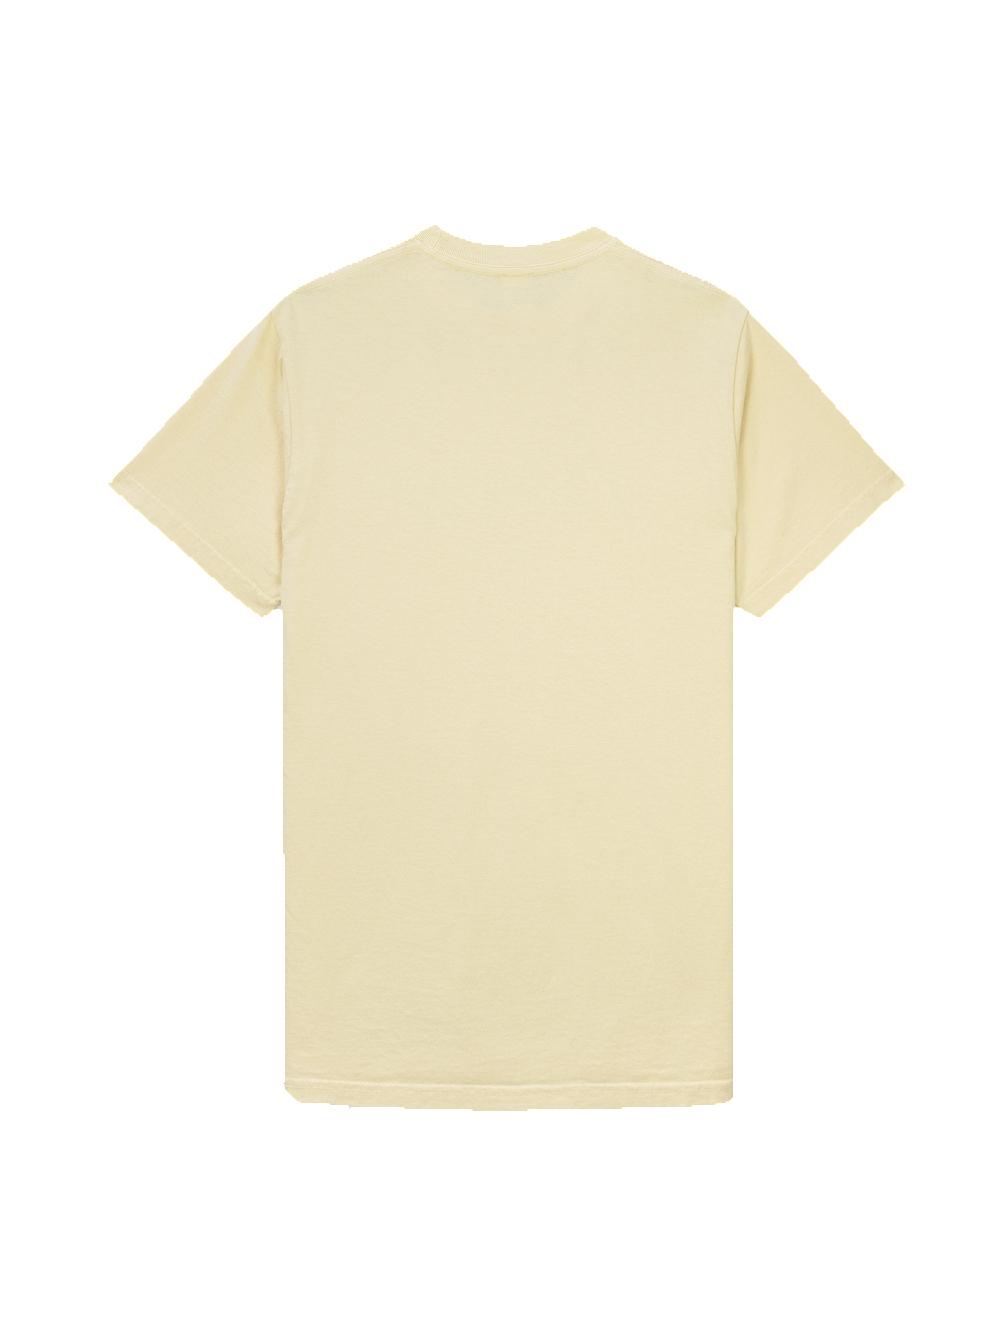 80's fitness t-shirt Beige Unisex Cotton SPORTY & RICH | T-shirts | TS164CP